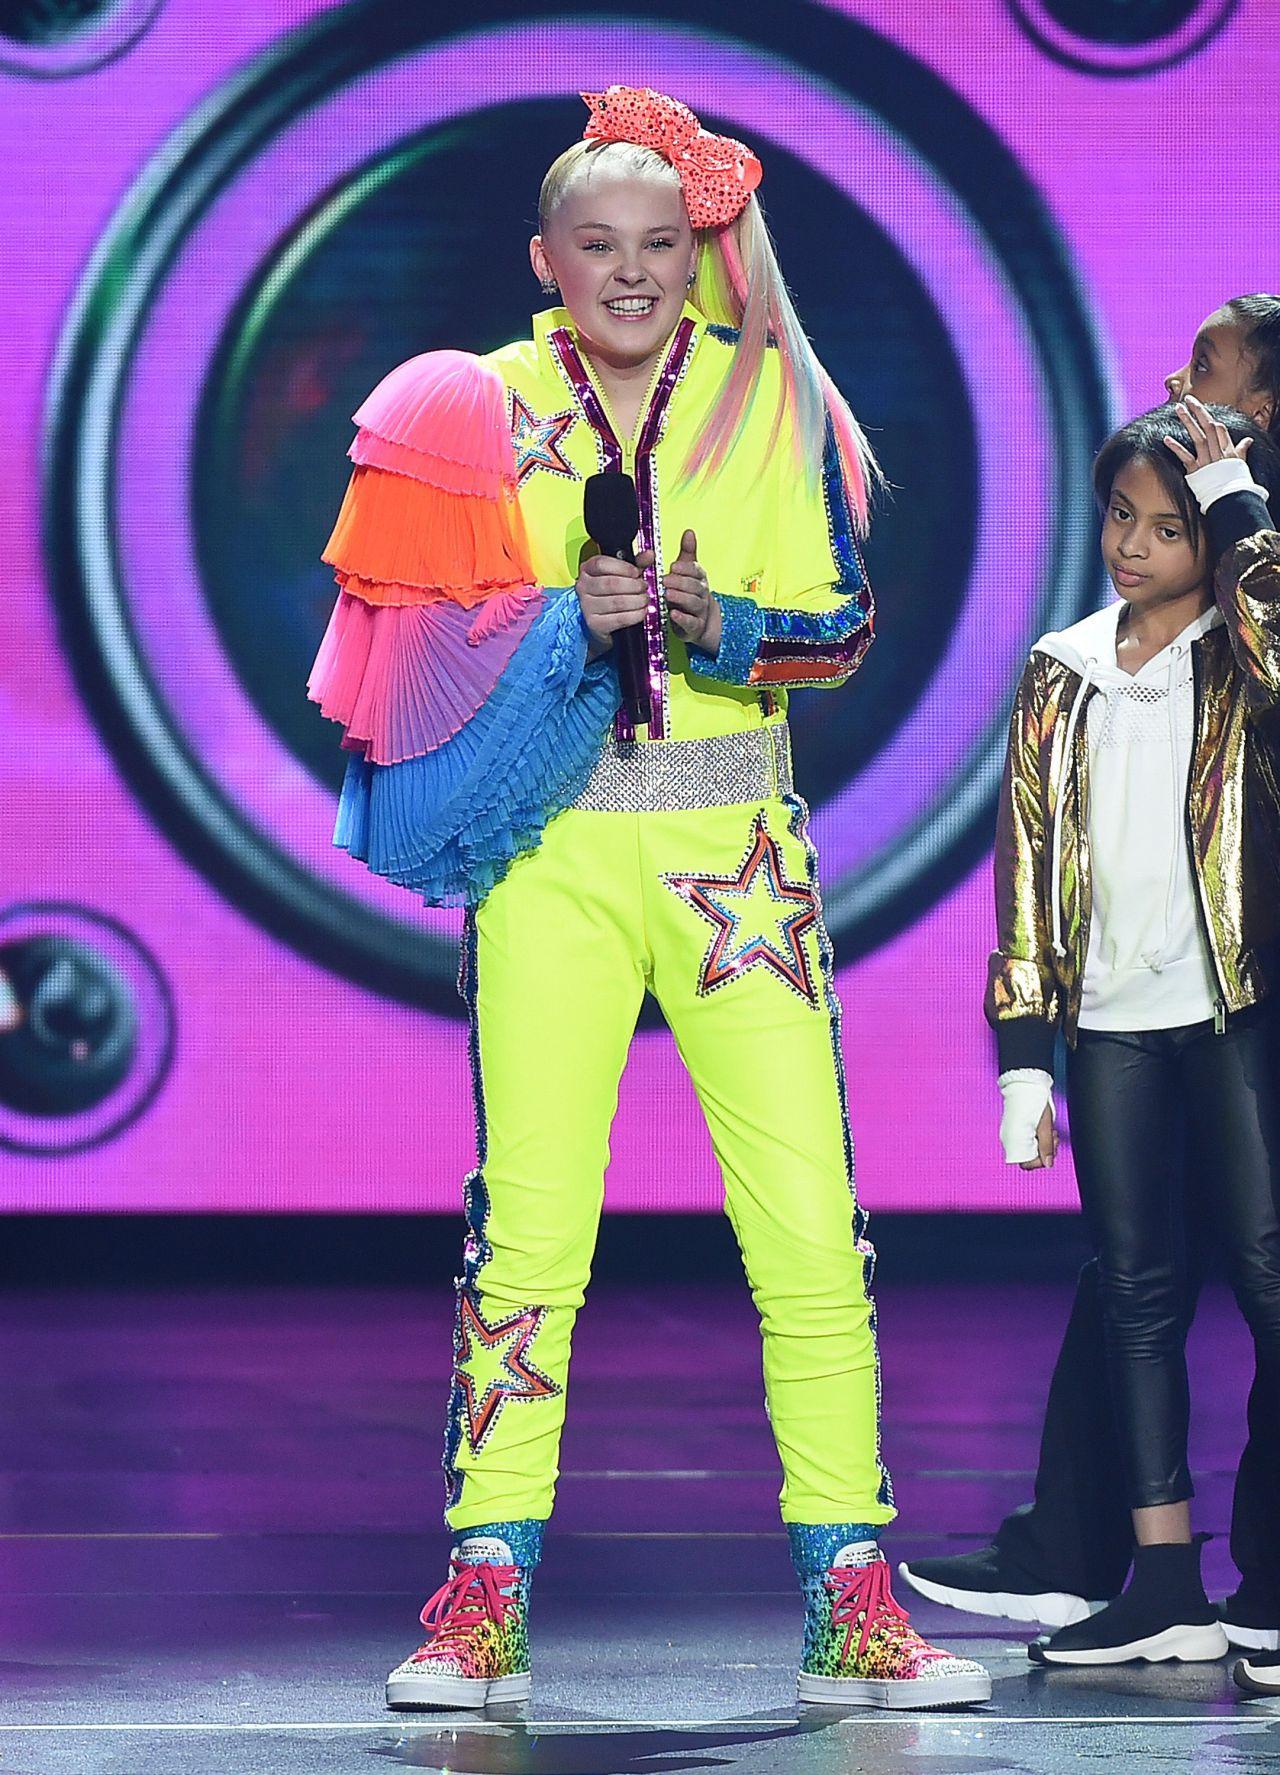 Jojo Siwa Kids Choice Awards 2019